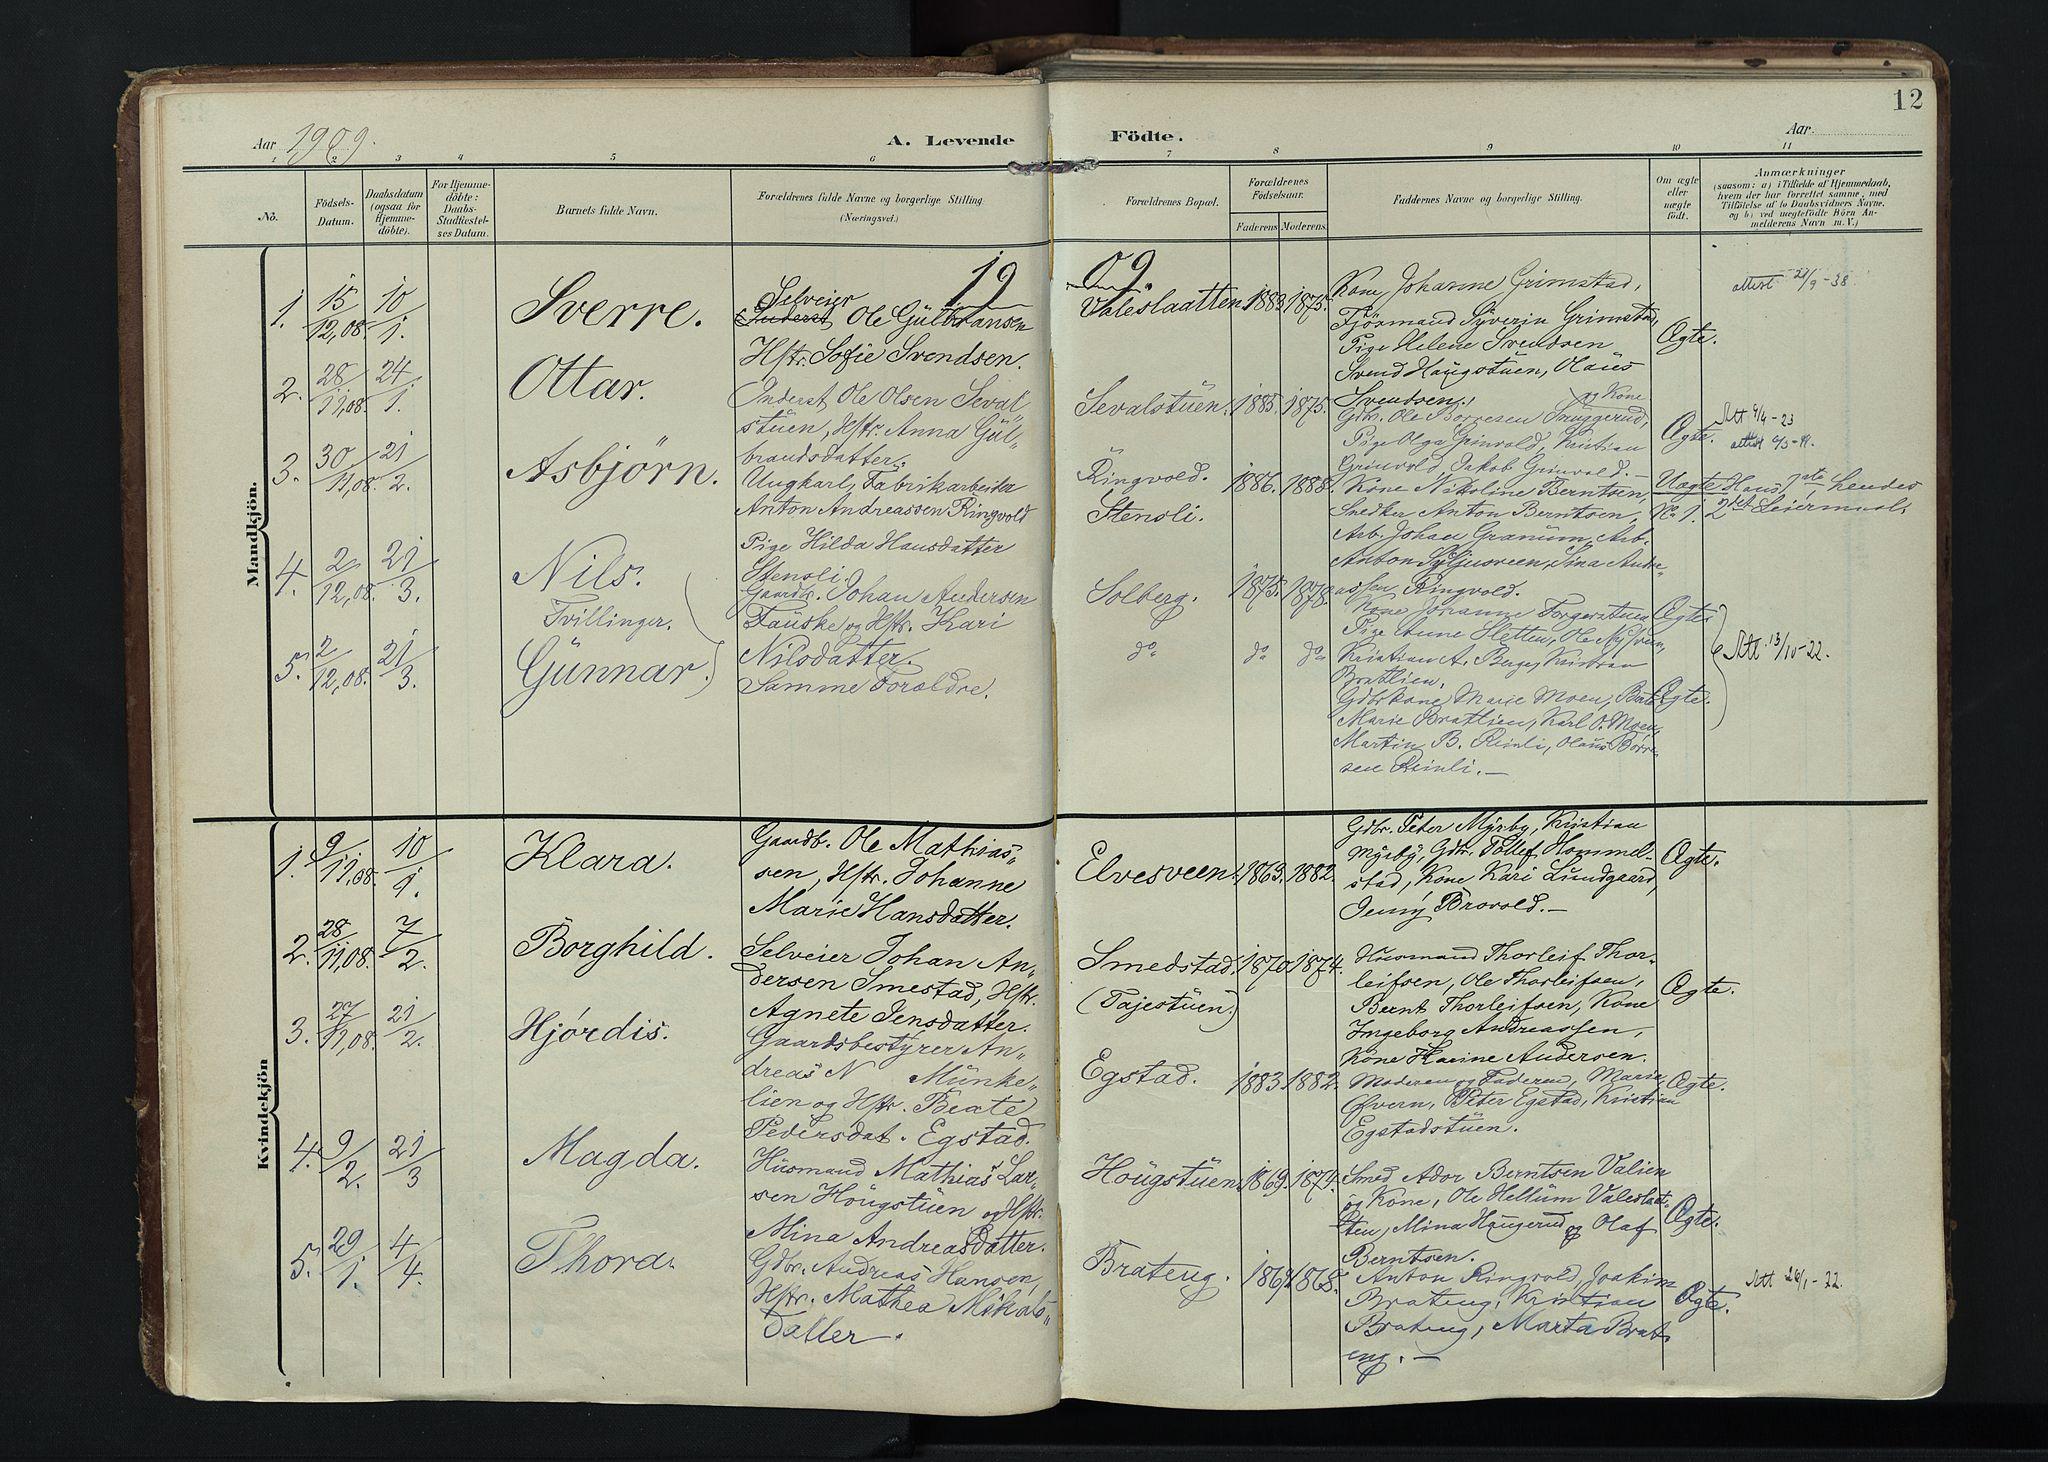 SAH, Vardal prestekontor, H/Ha/Haa/L0020: Ministerialbok nr. 20, 1907-1921, s. 12